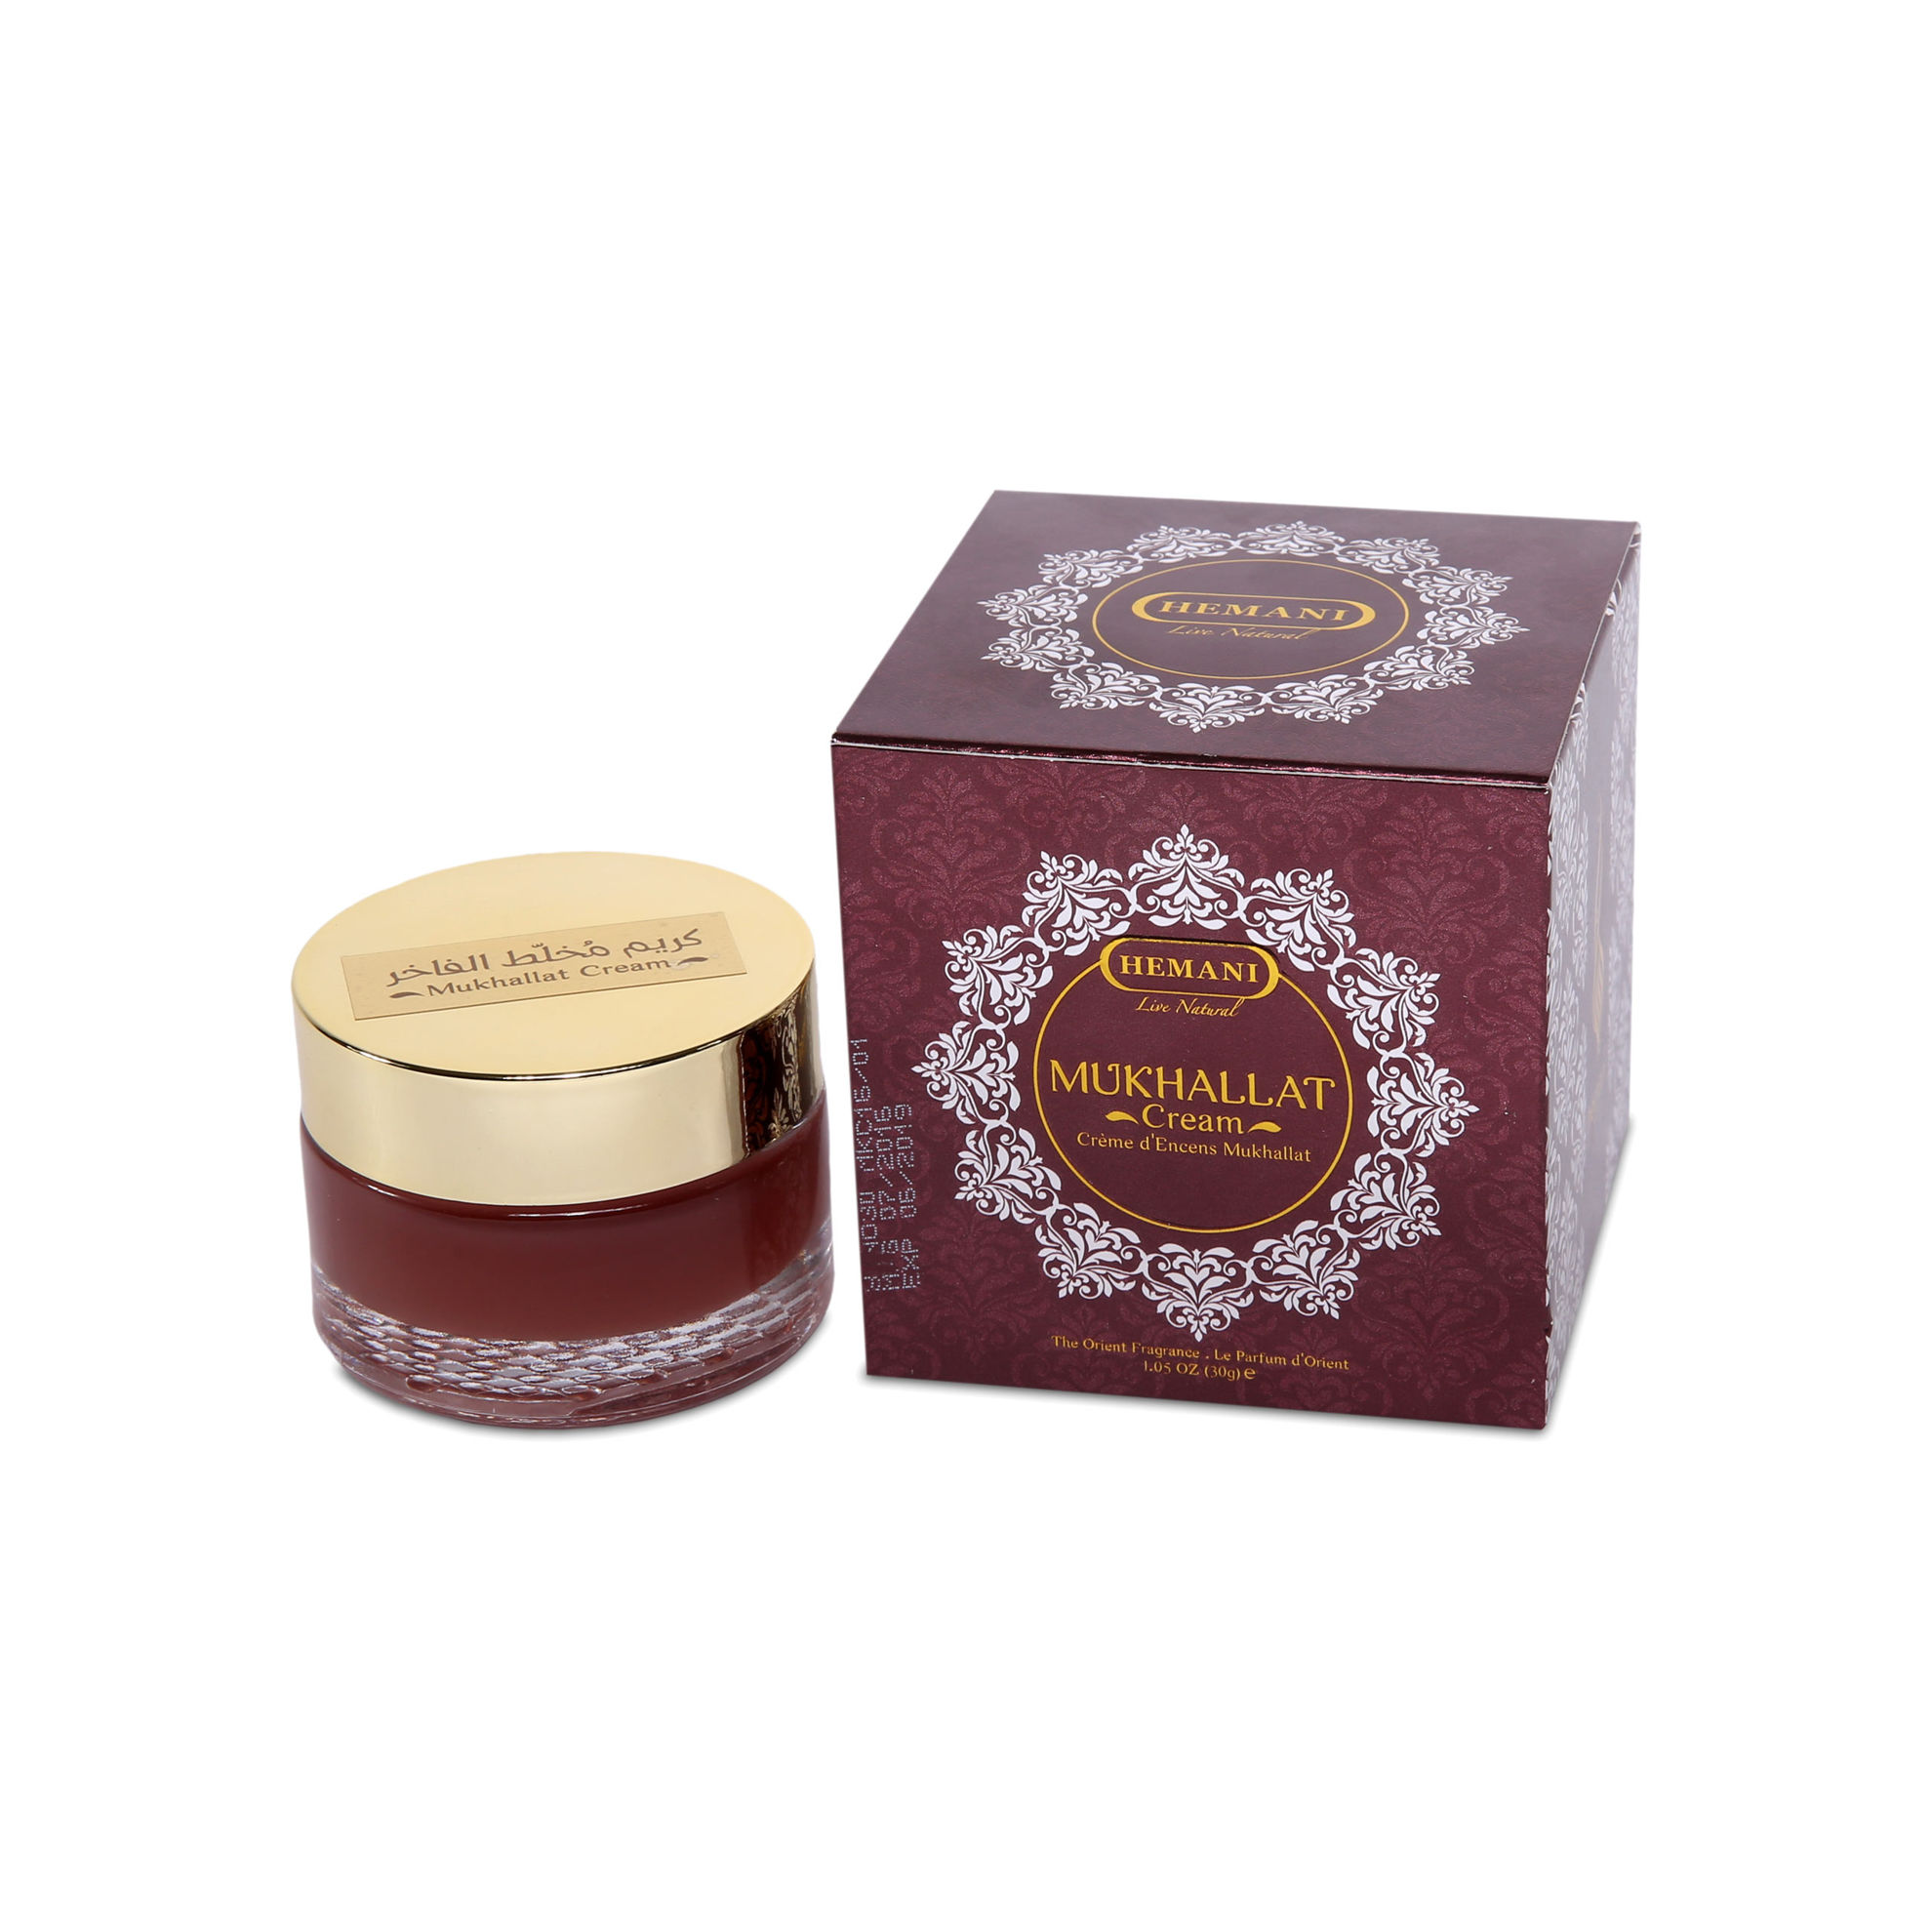 Mukhallat Fragrance Cream